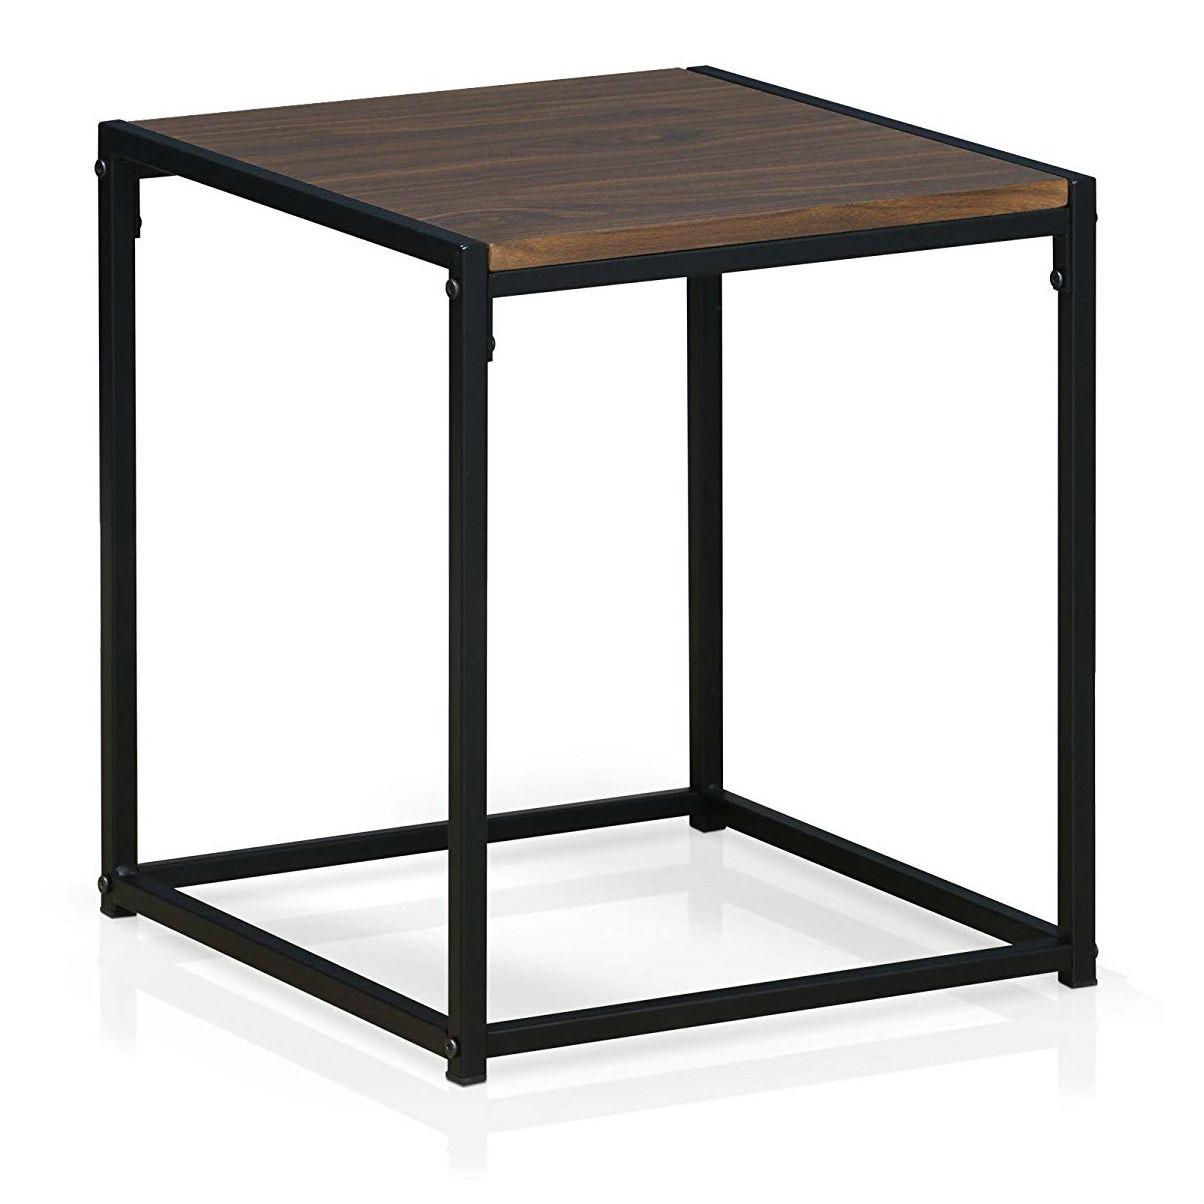 Modern Black Metal End Table Nightstand With Dark Walnut Wood Finish Top